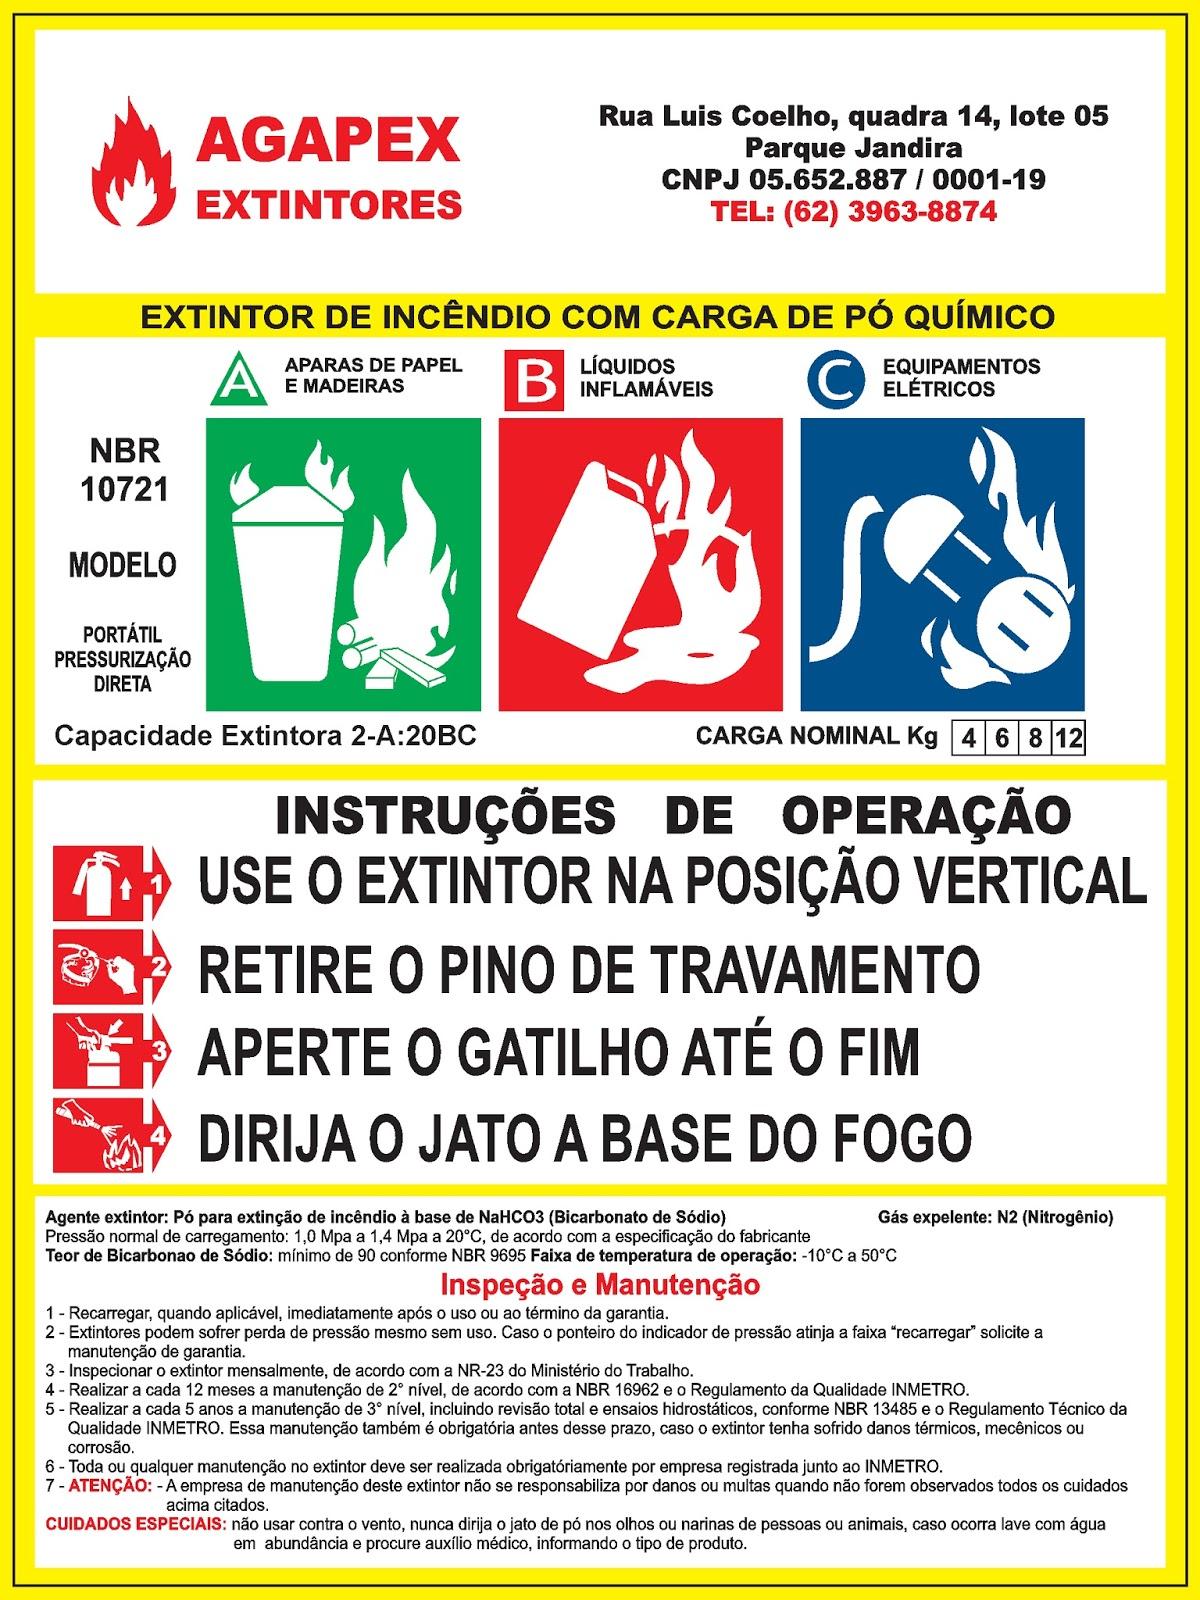 Adesivo Demarcação De Solo Extintor ~ LL Design Gráfico Adesivo Extintor de Inc u00eandio